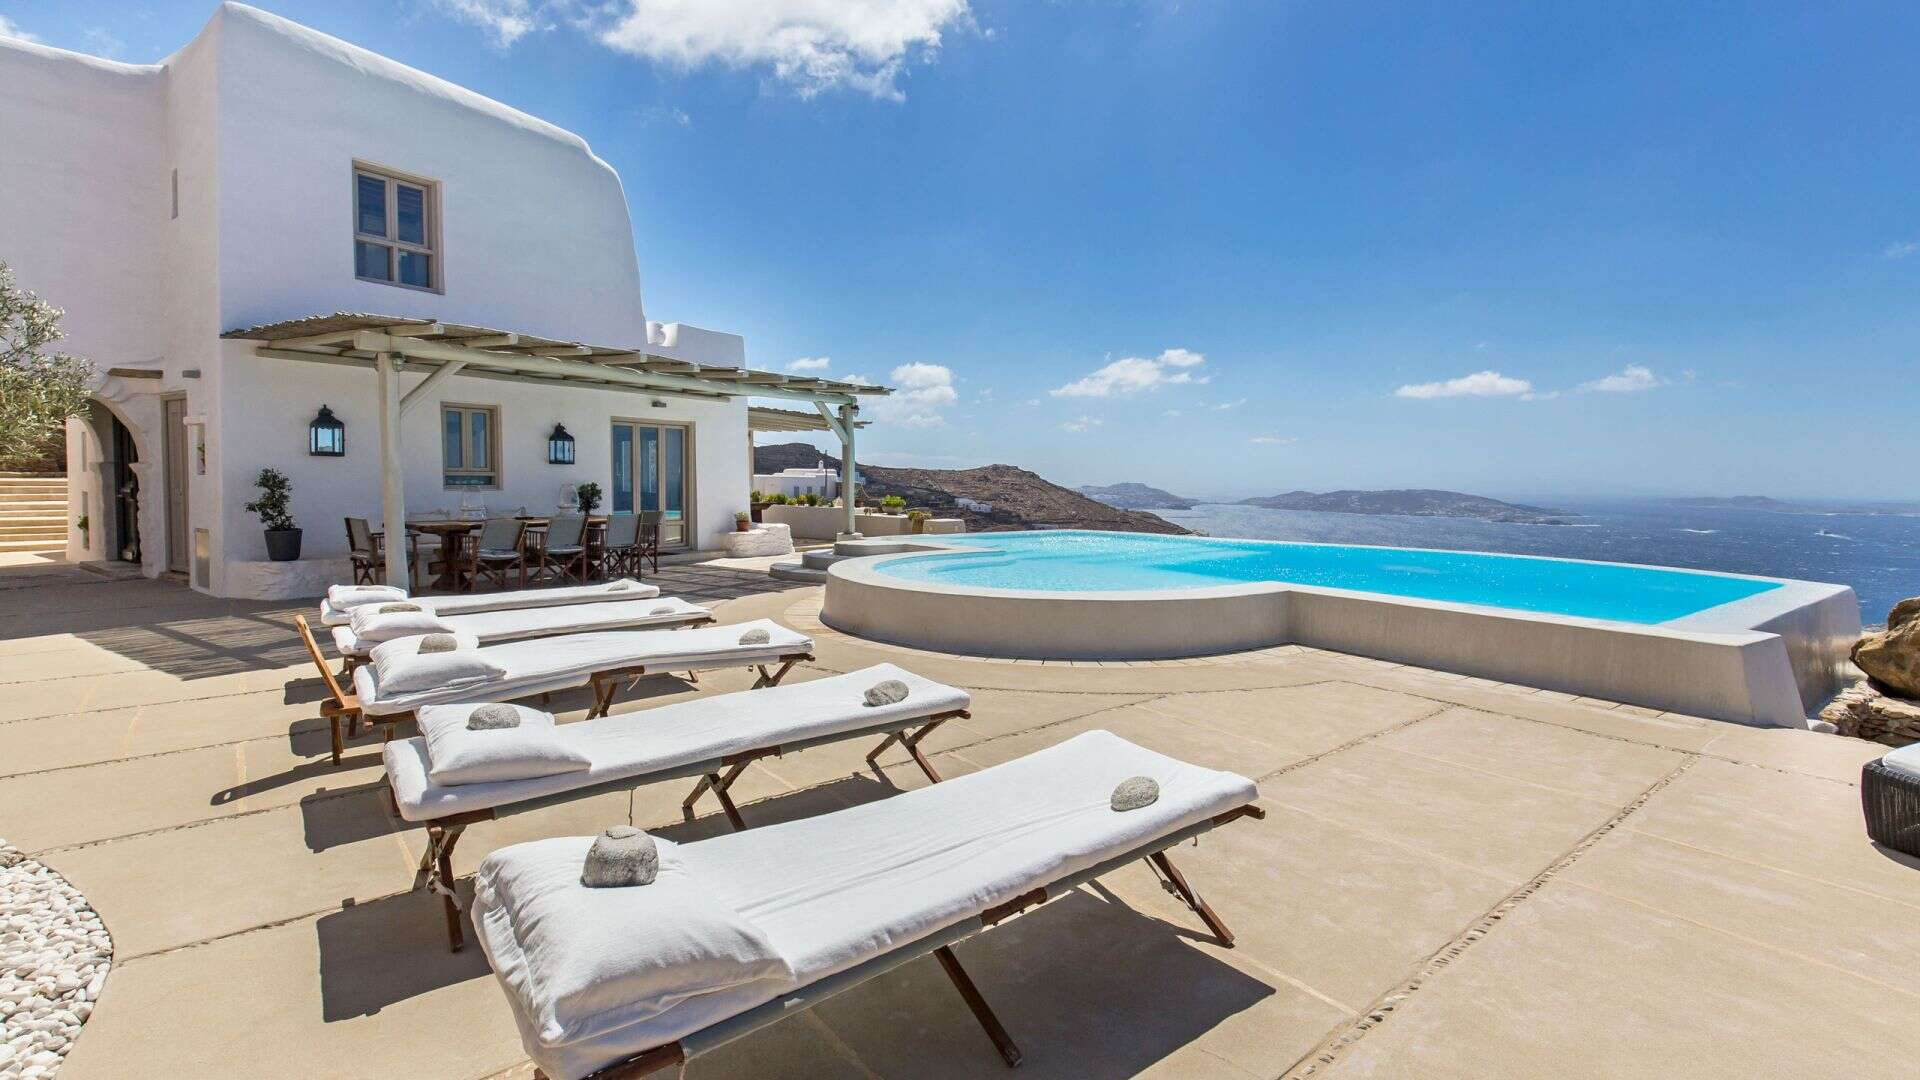 Luxury vacation rentals europe - Greece - Mykonos - Fanari - The Eagle's Nest - Image 1/26